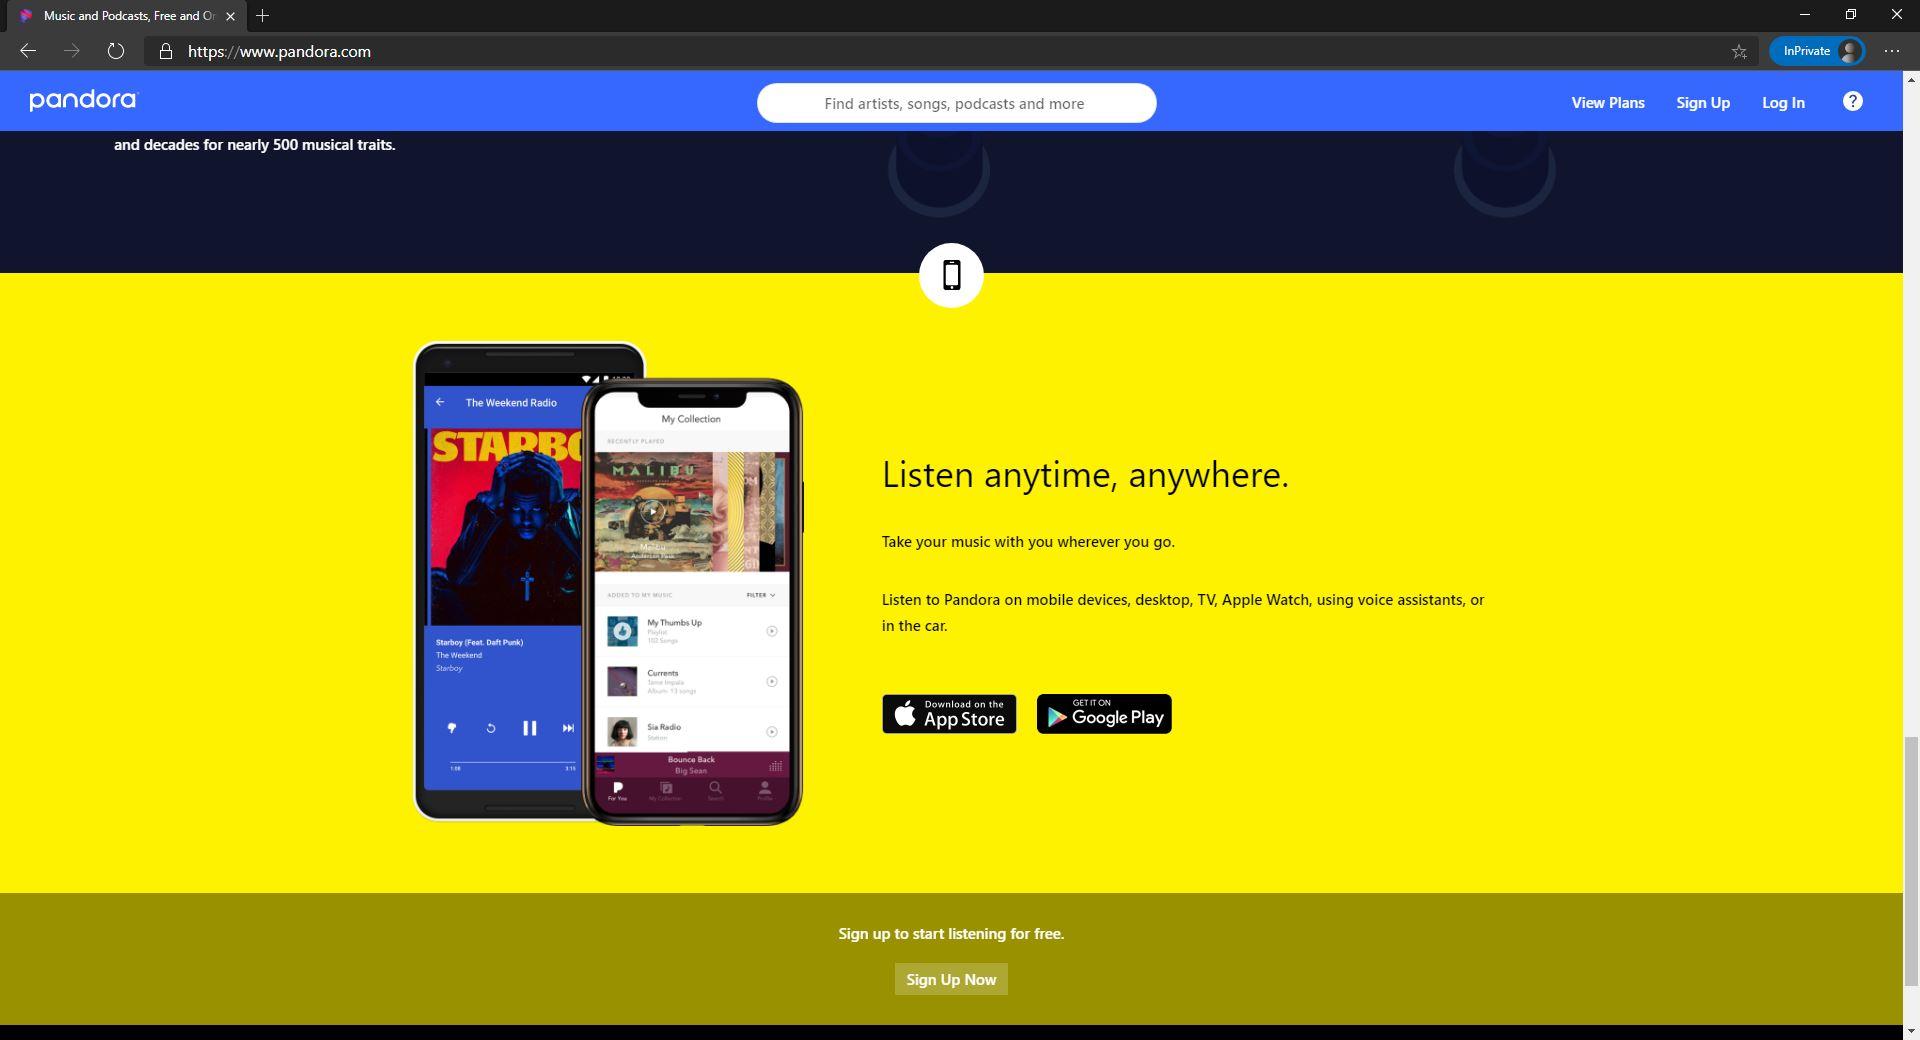 Pandora website homepage